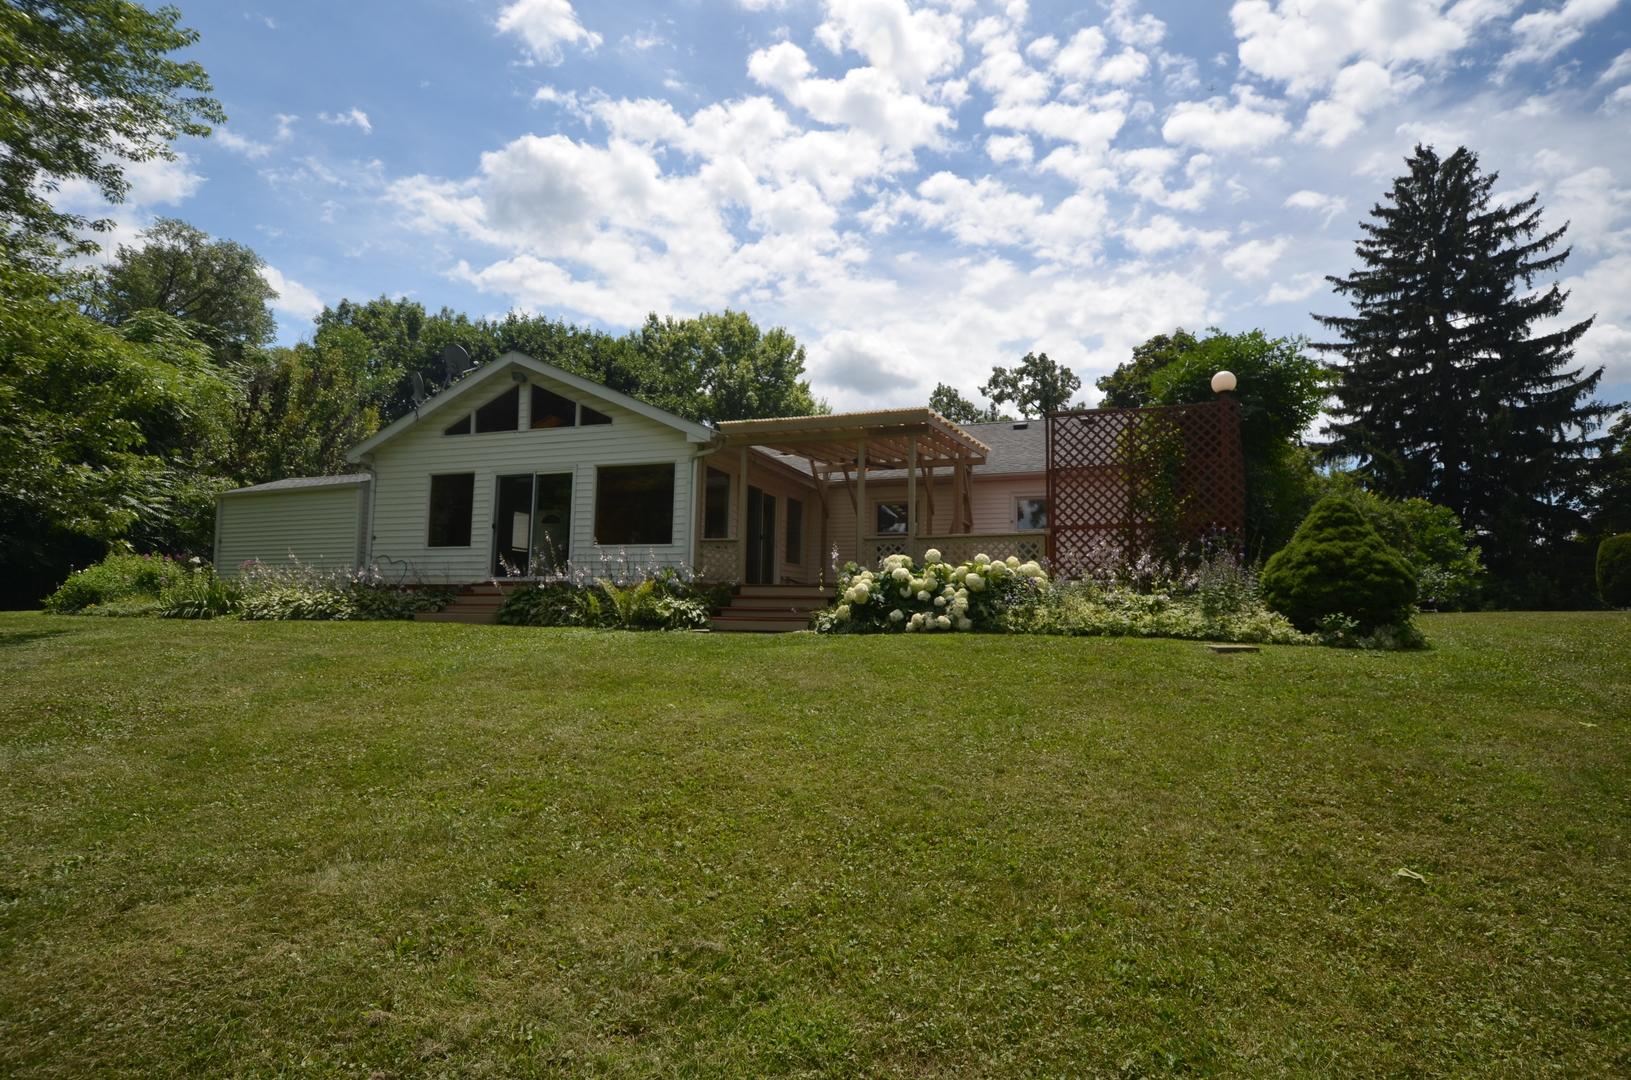 480 W Terra Cotta Avenue, Crystal Lake, IL 60014